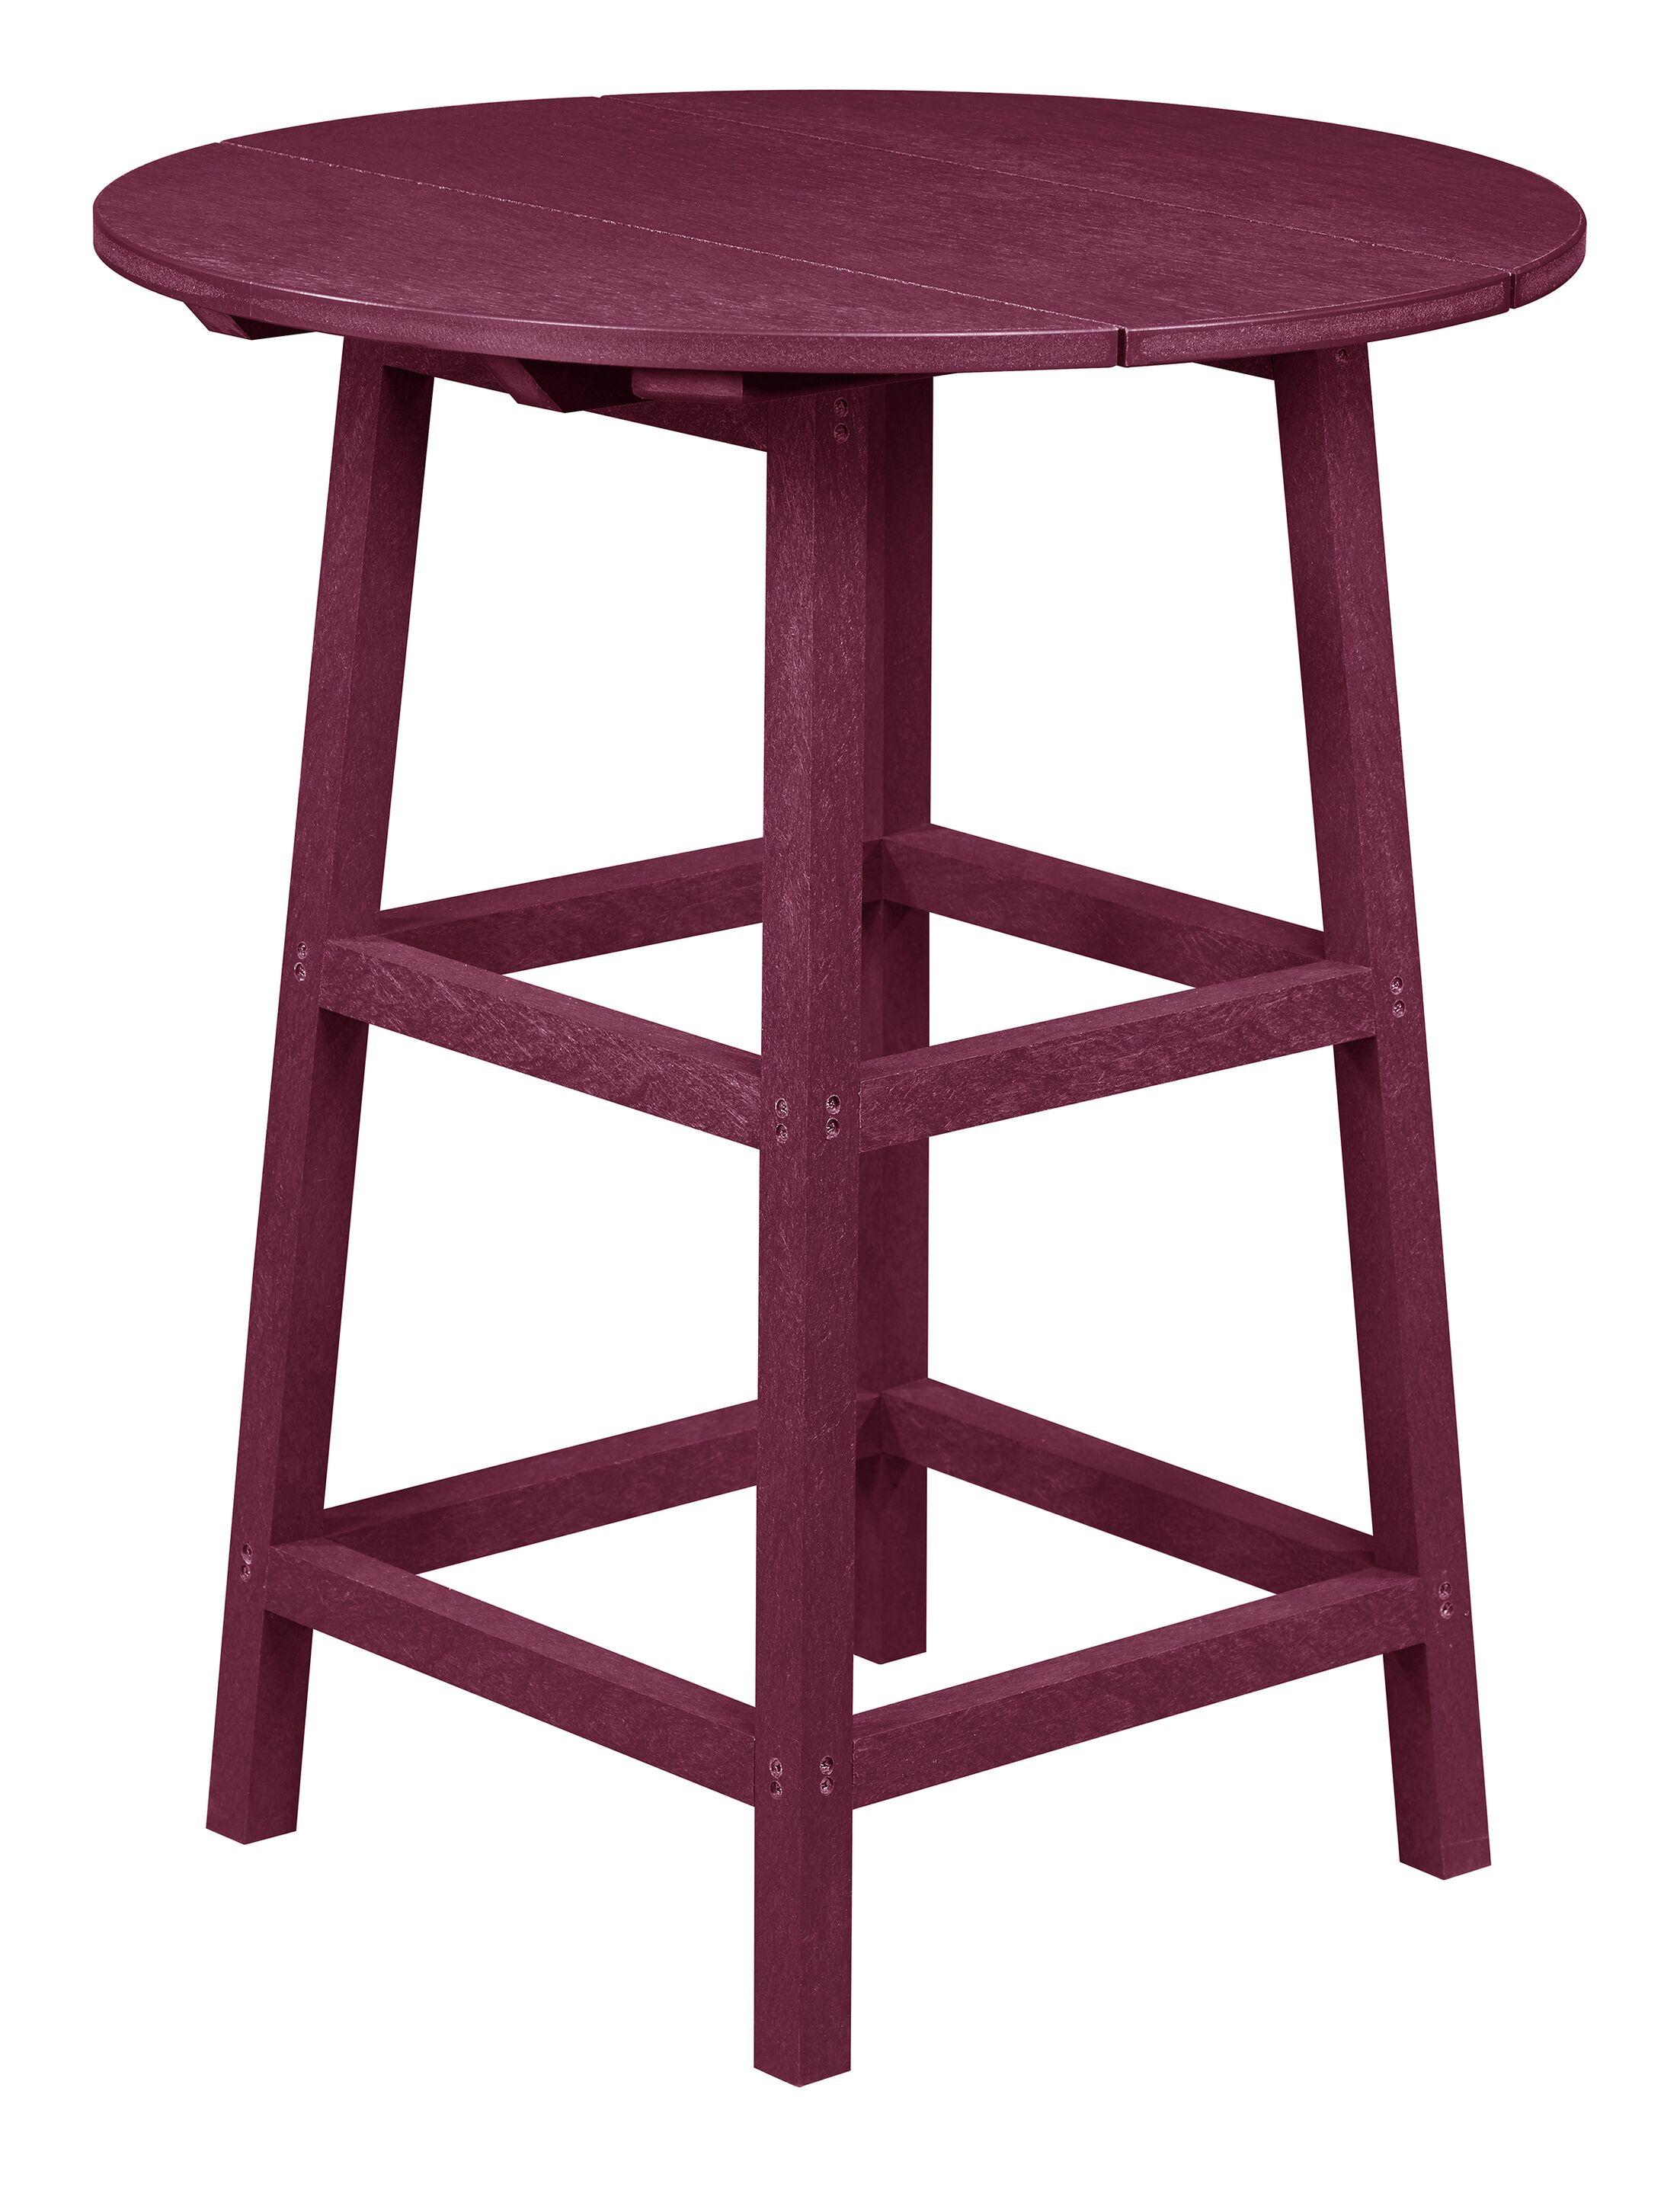 Kratochvil Plastic Bistro Table Table Size: 41